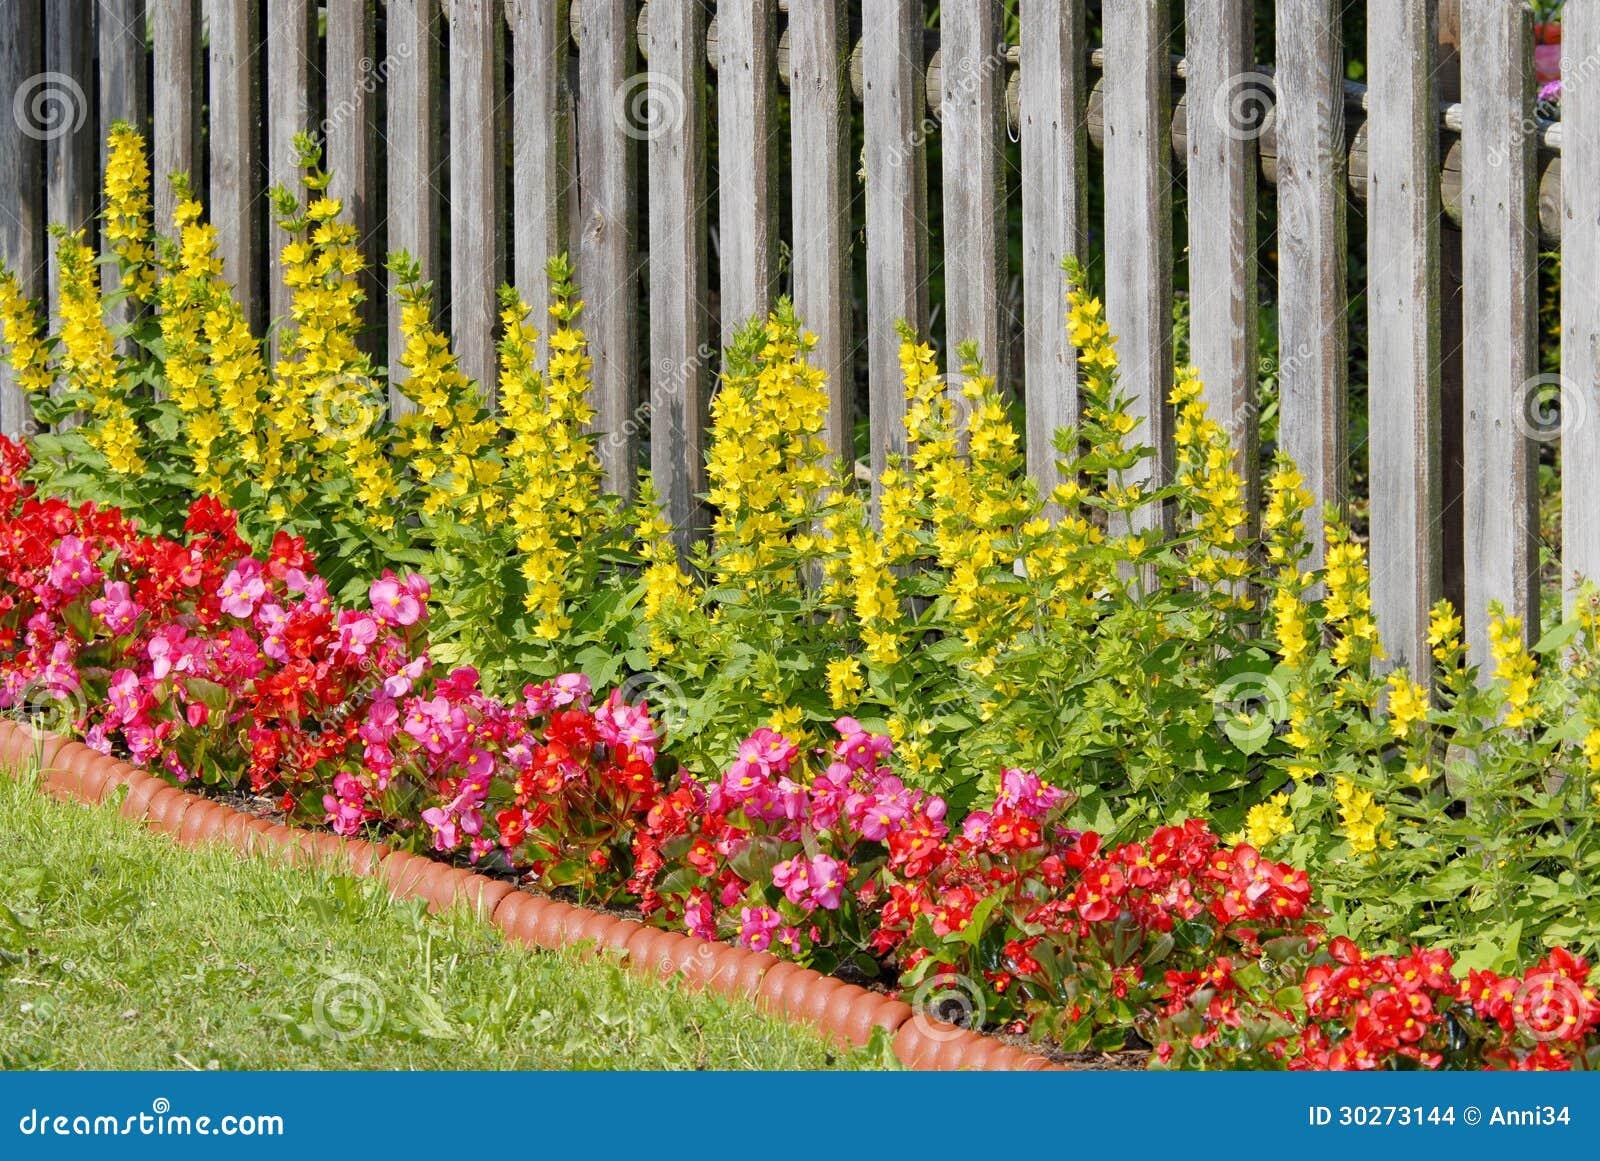 Flower Bed Stock Photo Image Of Wood Summer Park Border 30273144